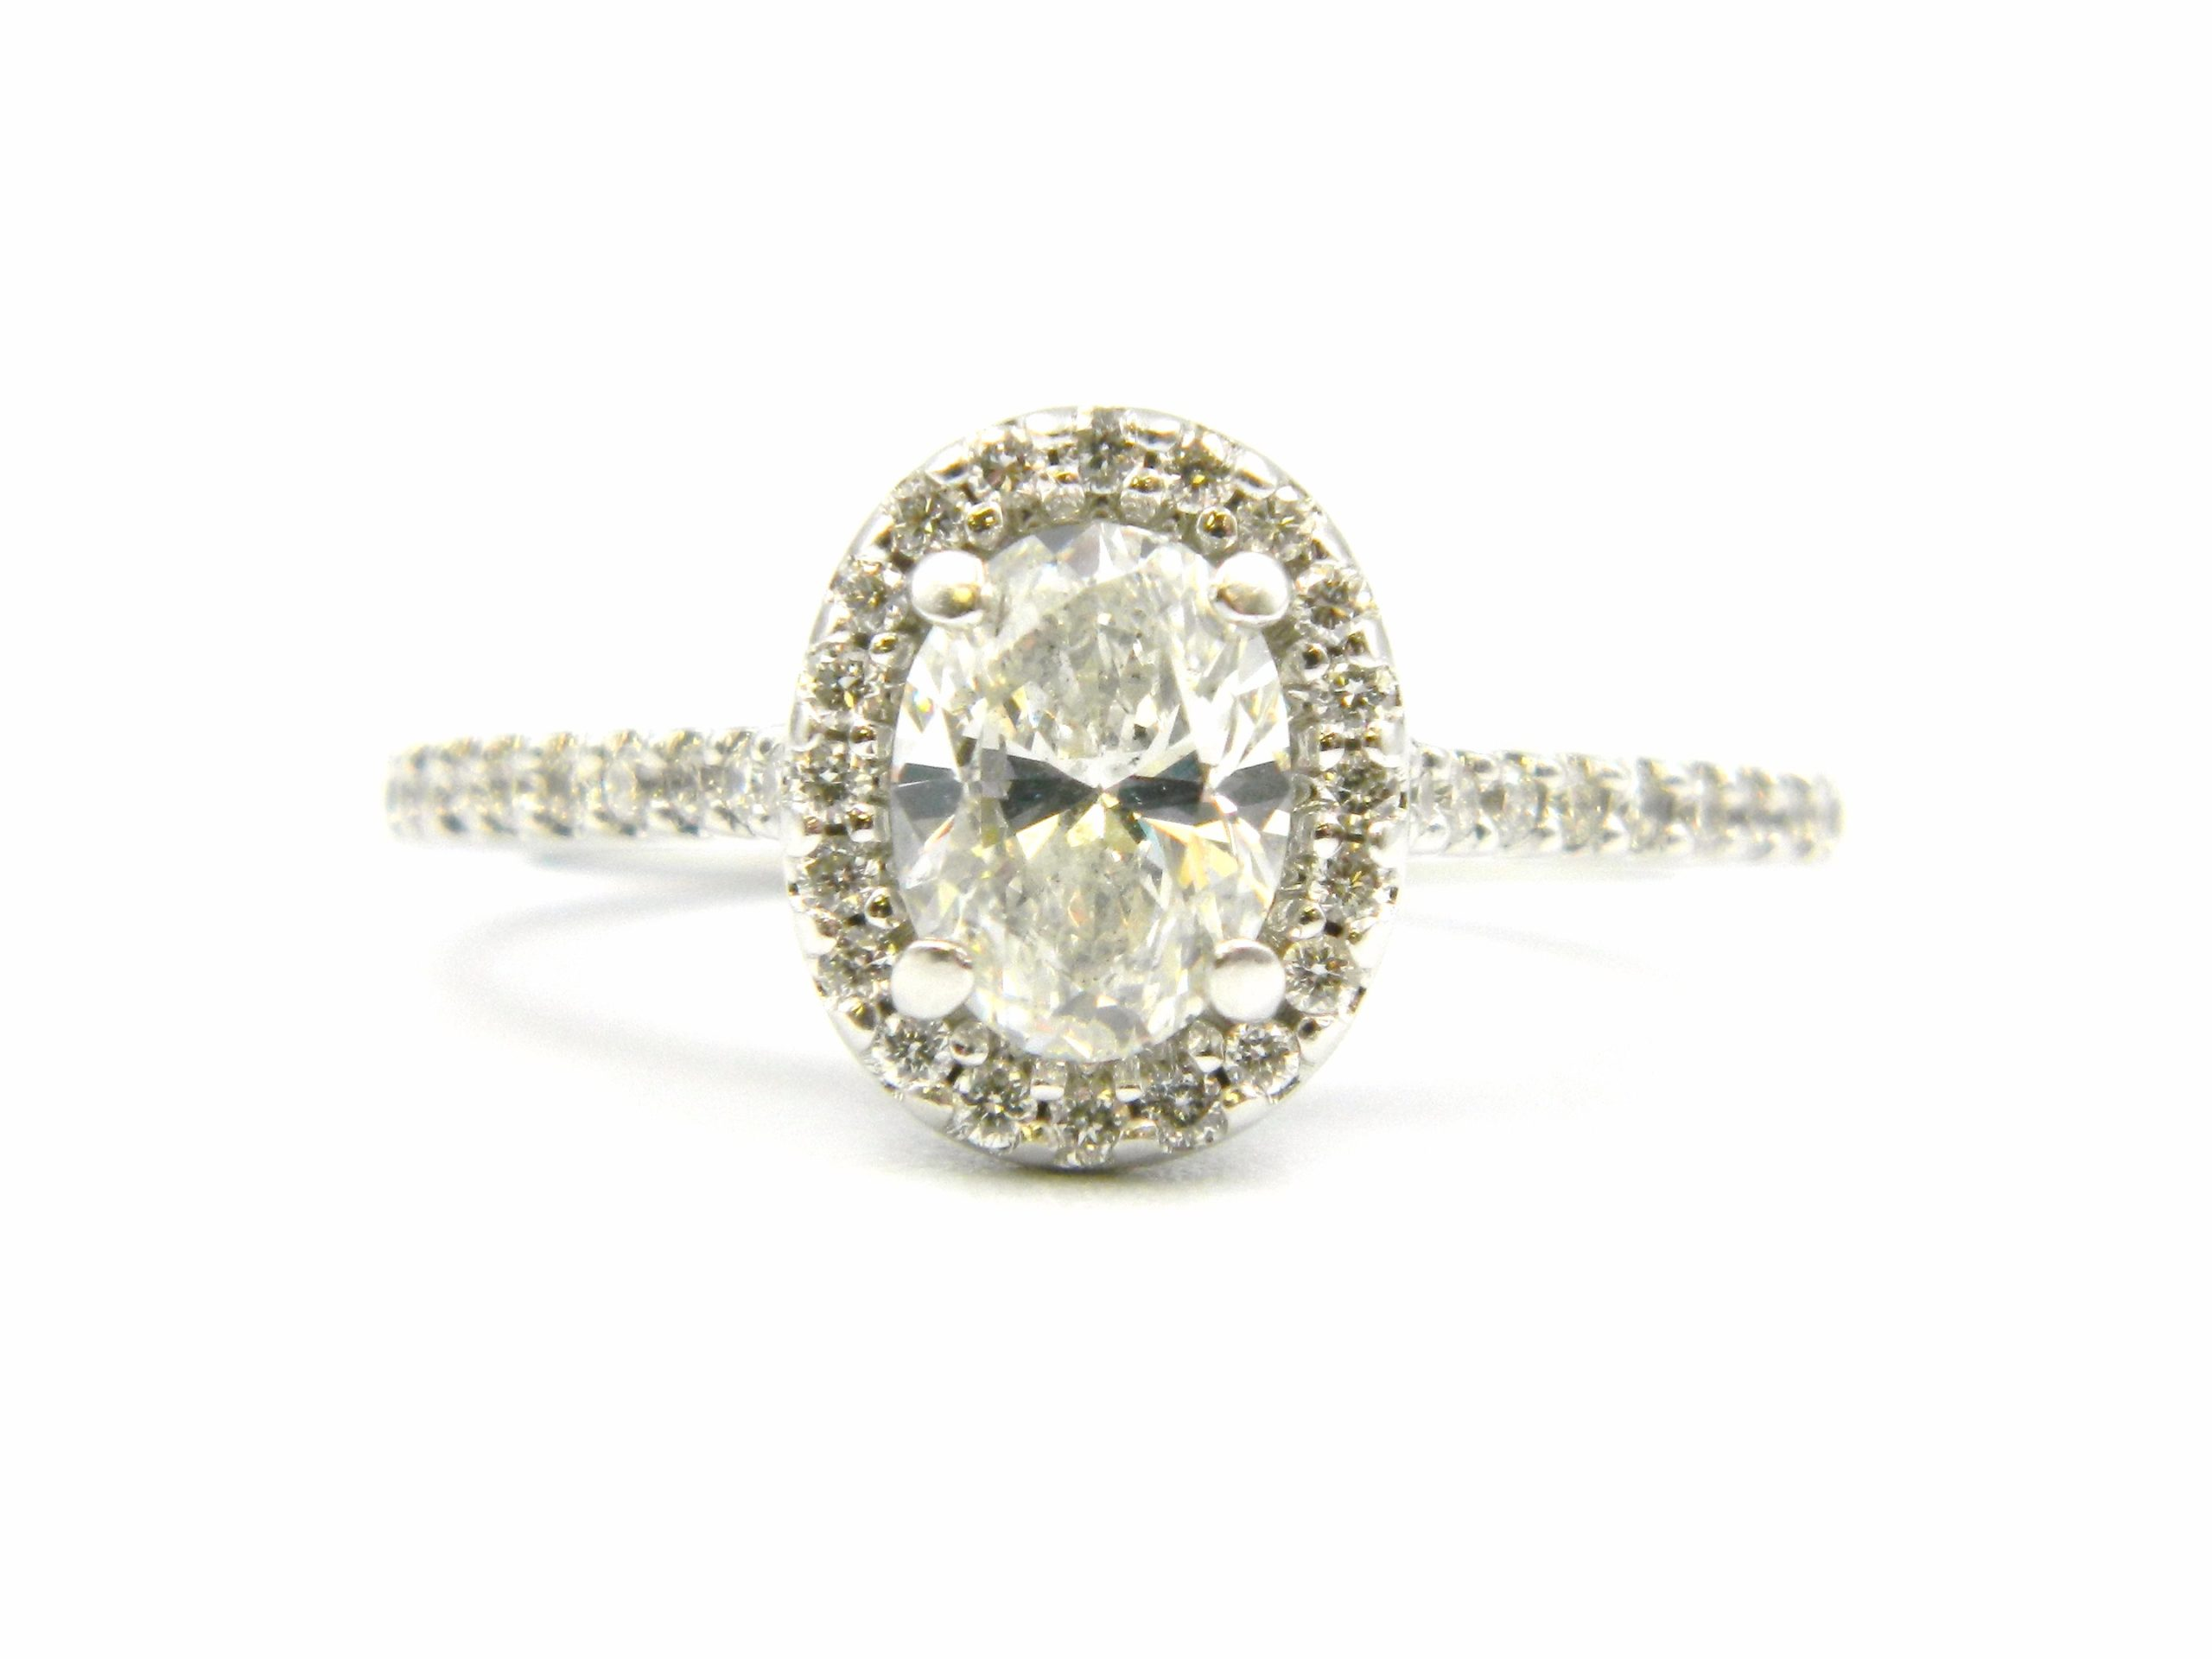 Estate Piece - White Gold Diamond Engagement Ring